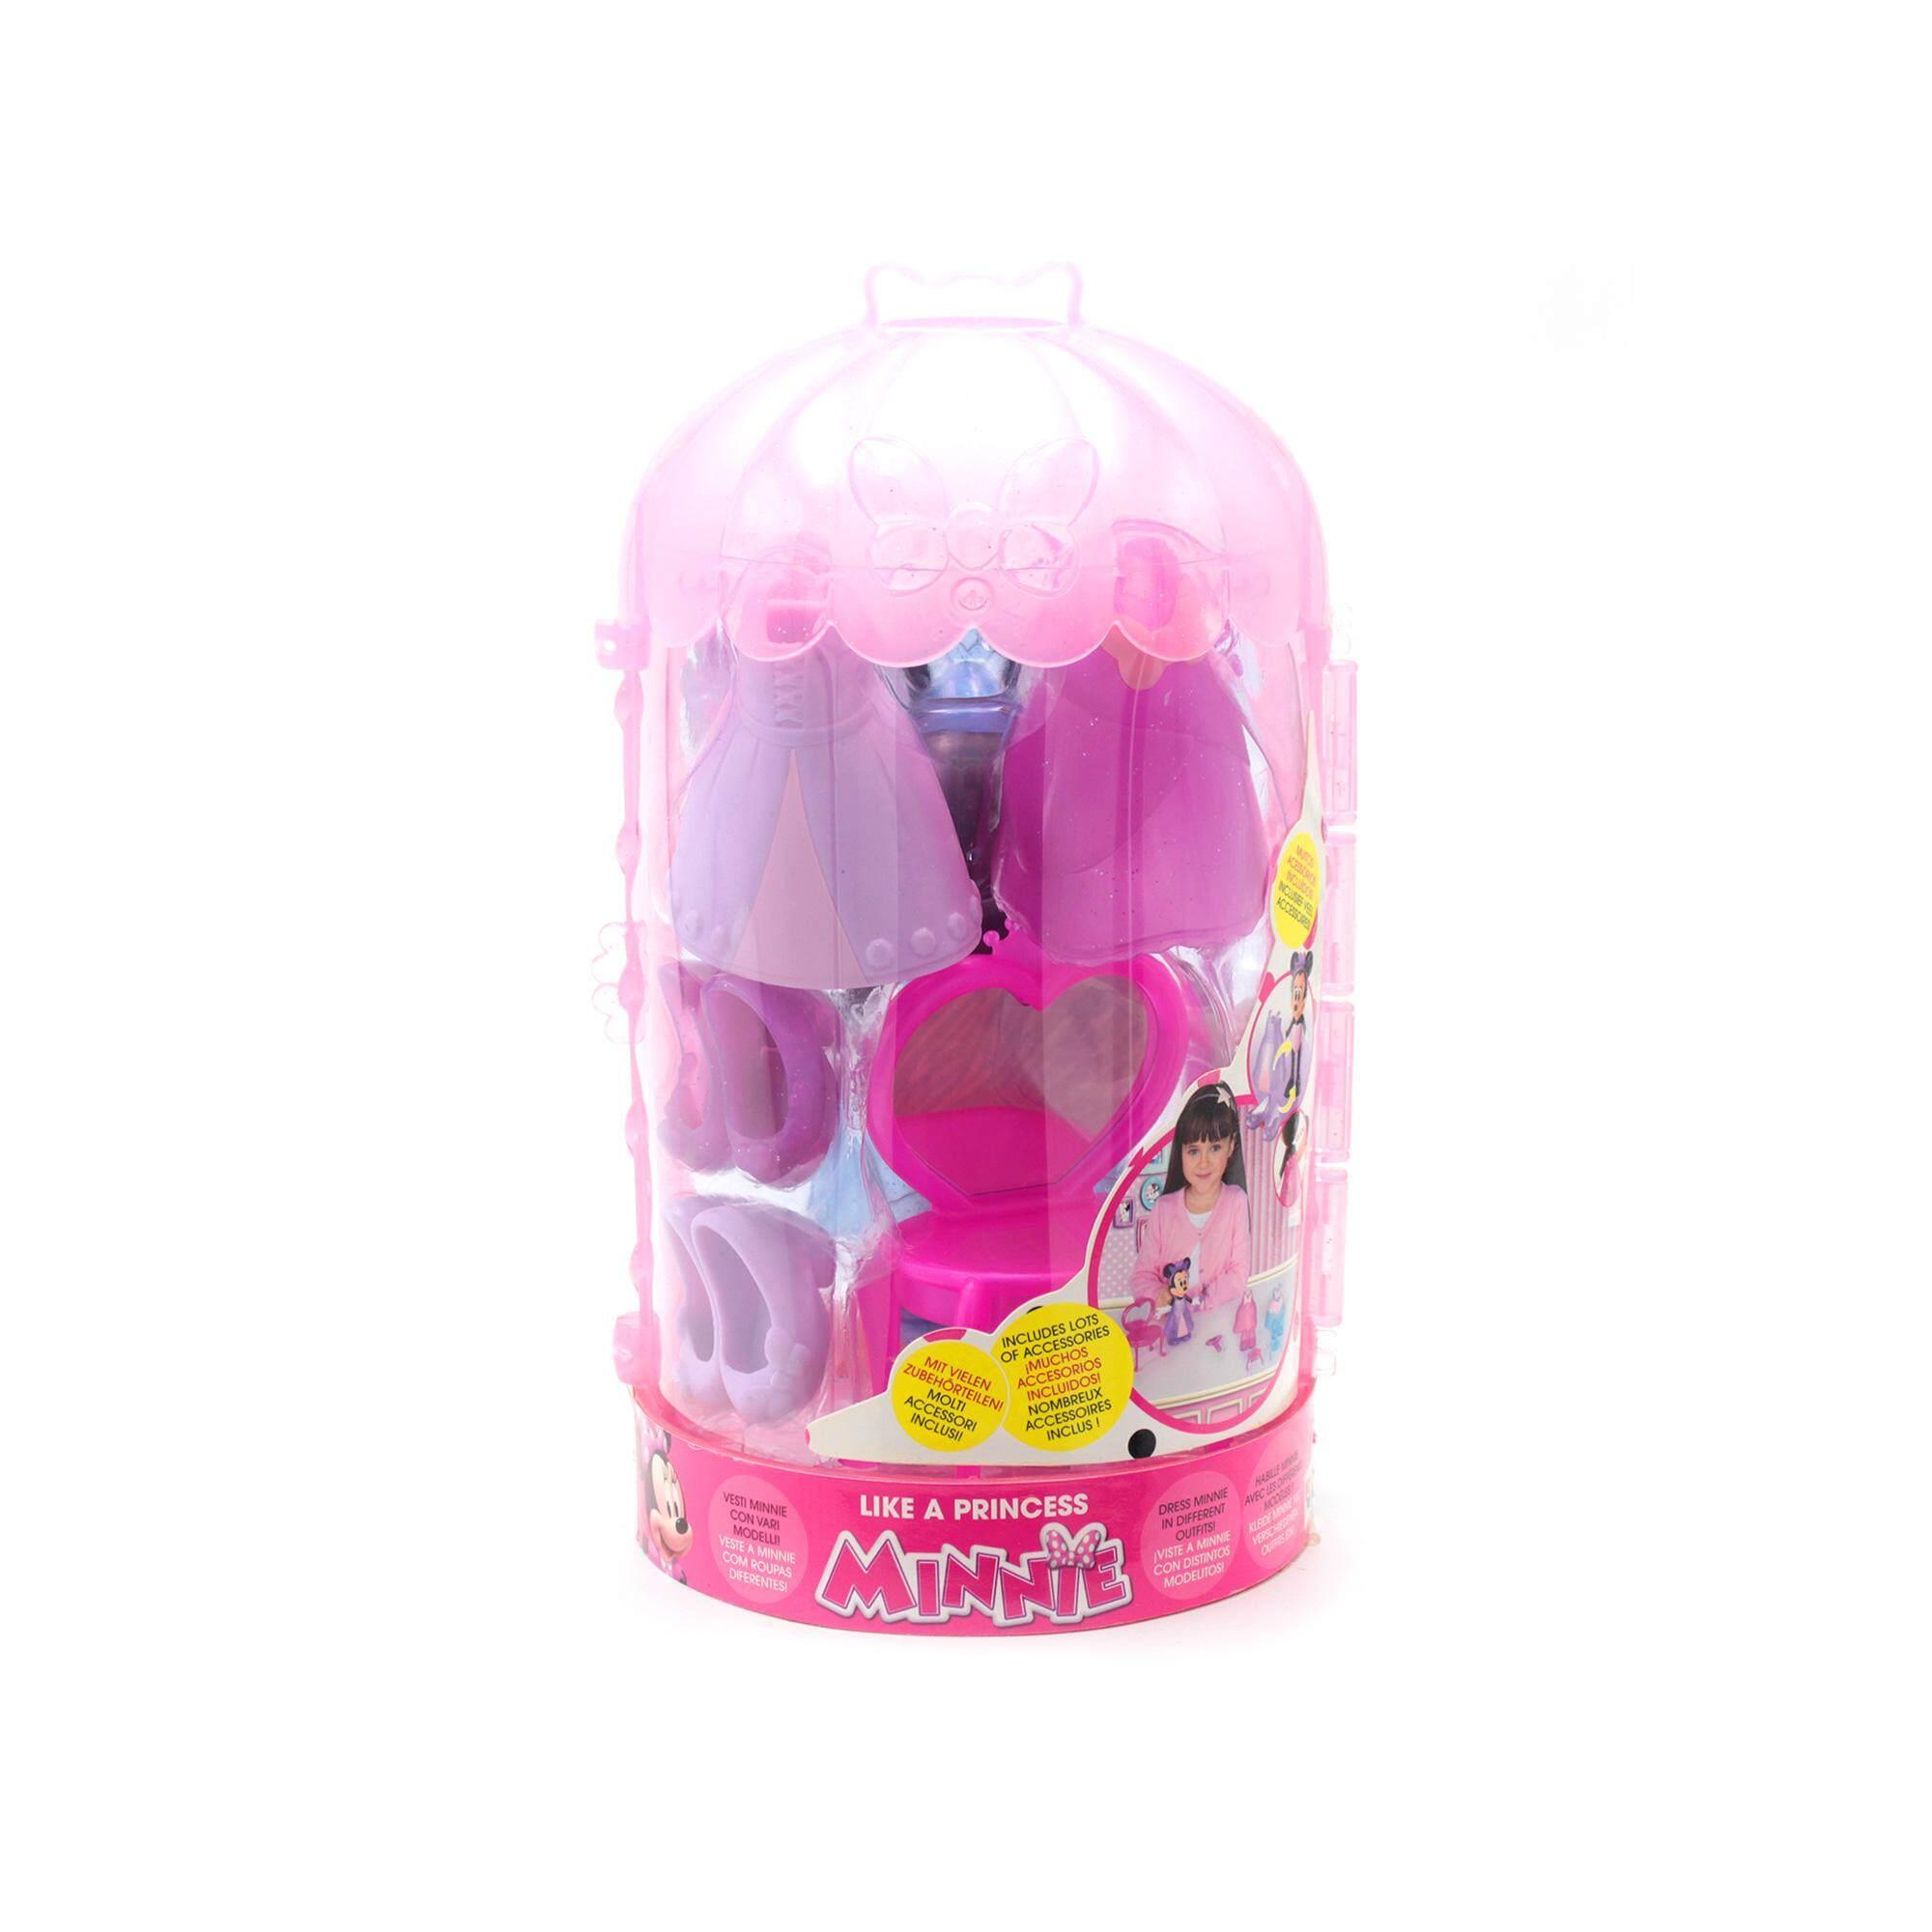 Disney Minnie Hard Toys With Accessories - Like A Princess